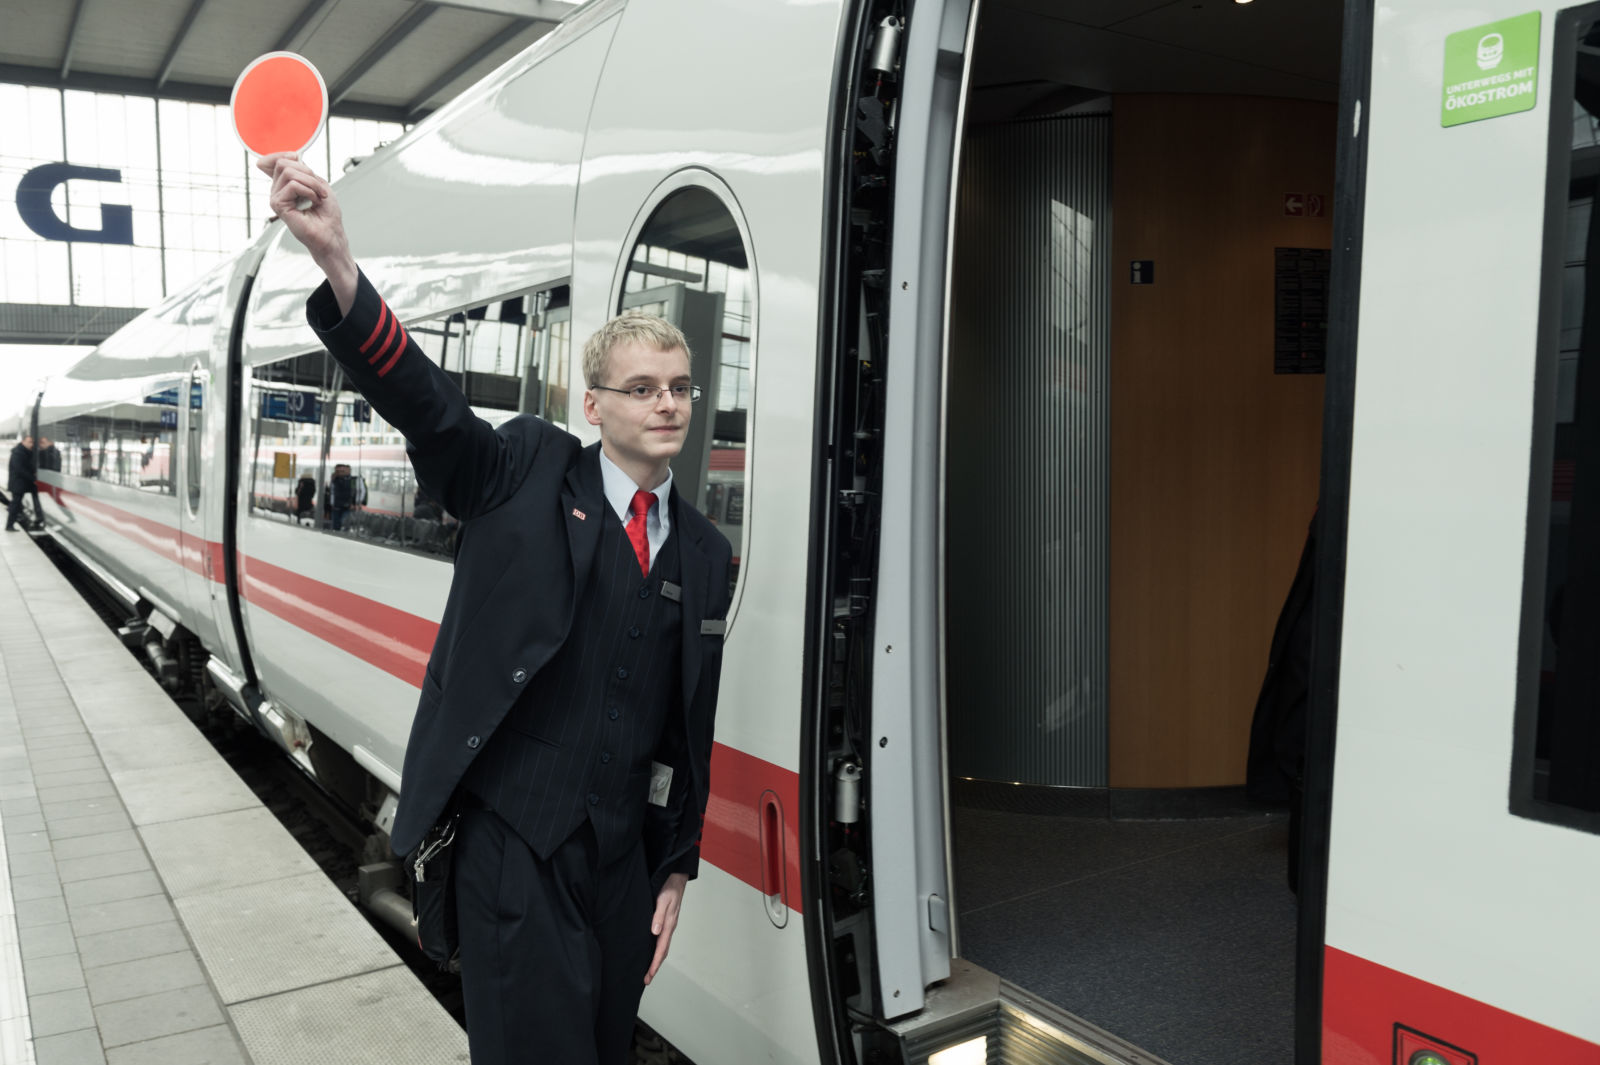 Eisenbahner mit Herz 2017 Christian Mainka, DB Fernverkehr